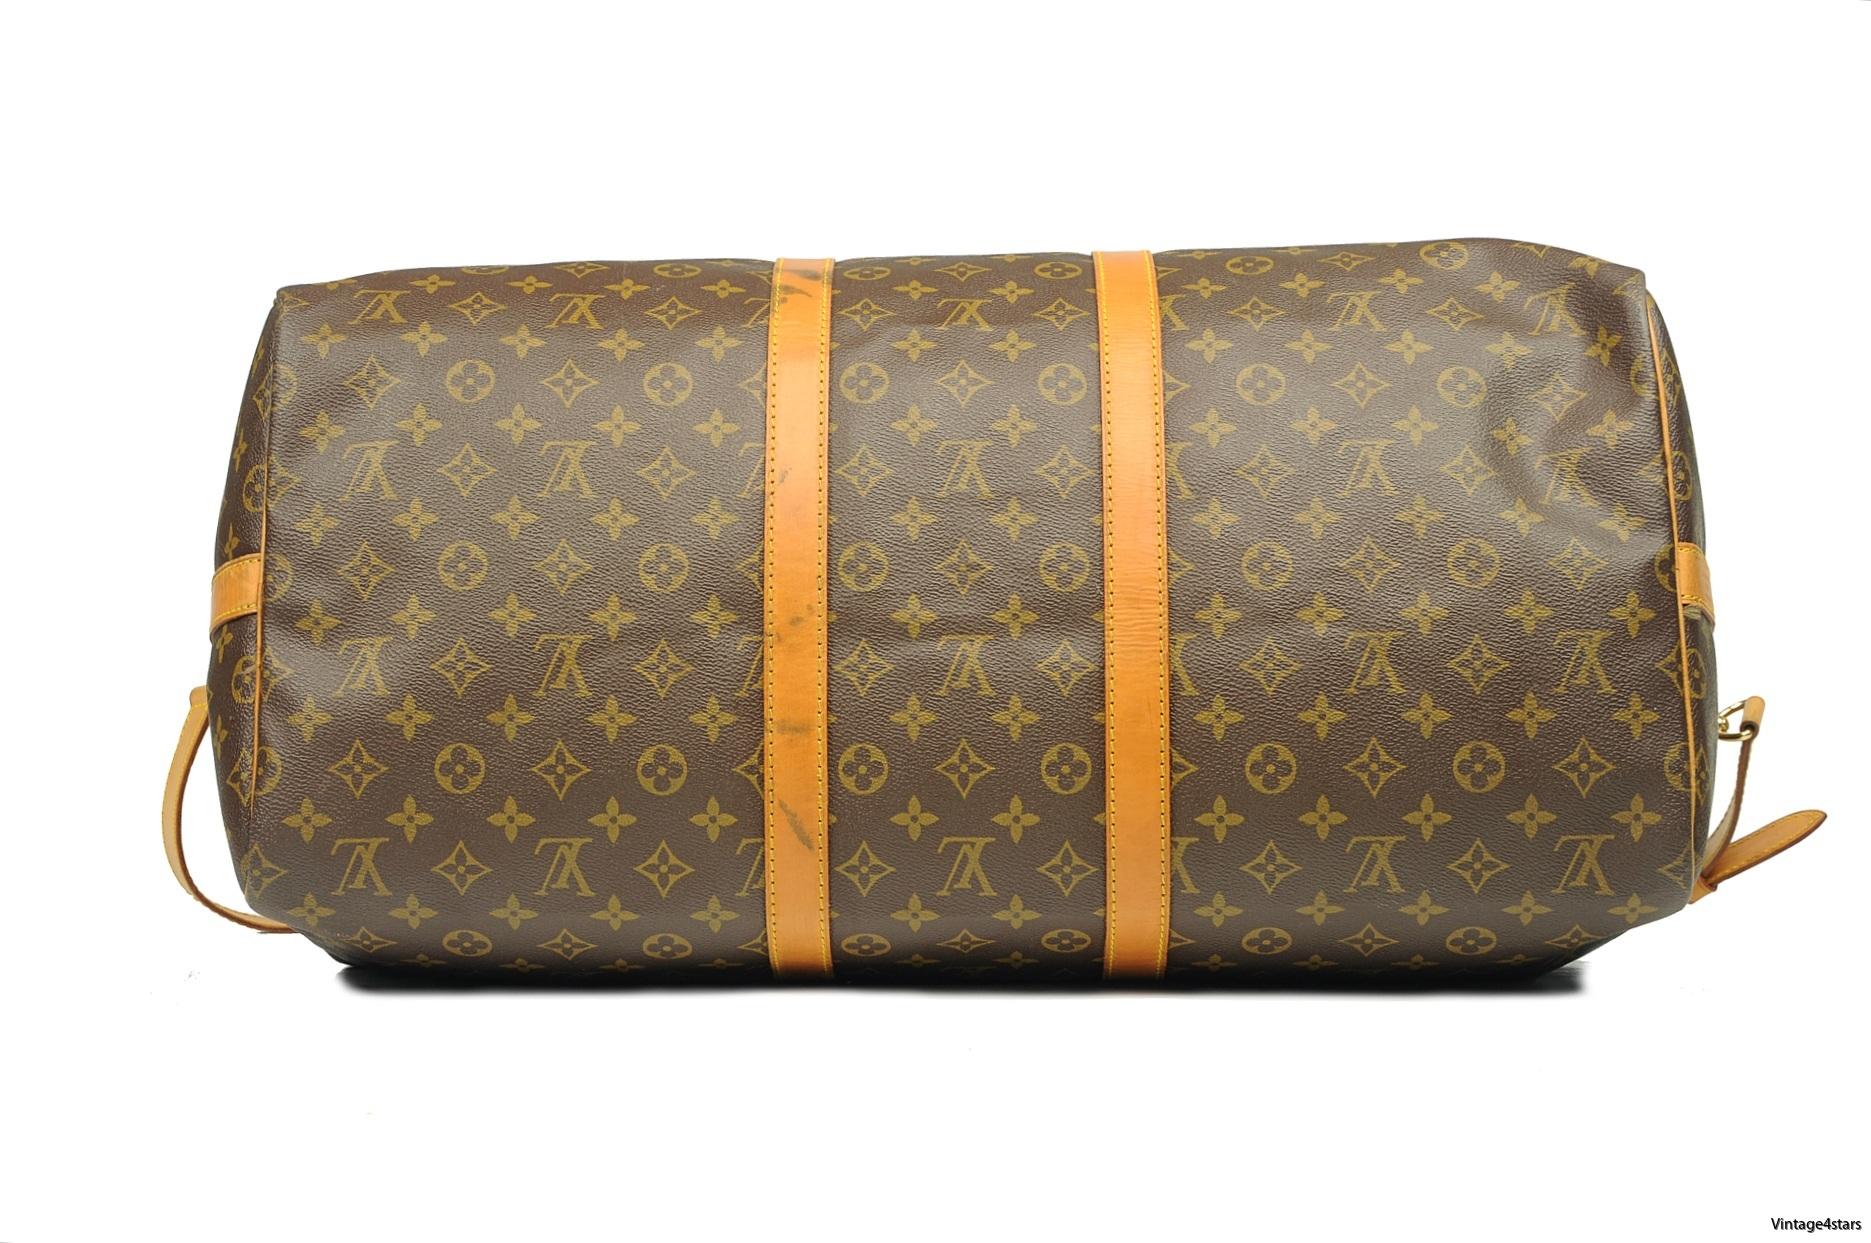 Louis Vuitton Keepall 55 Band 3a